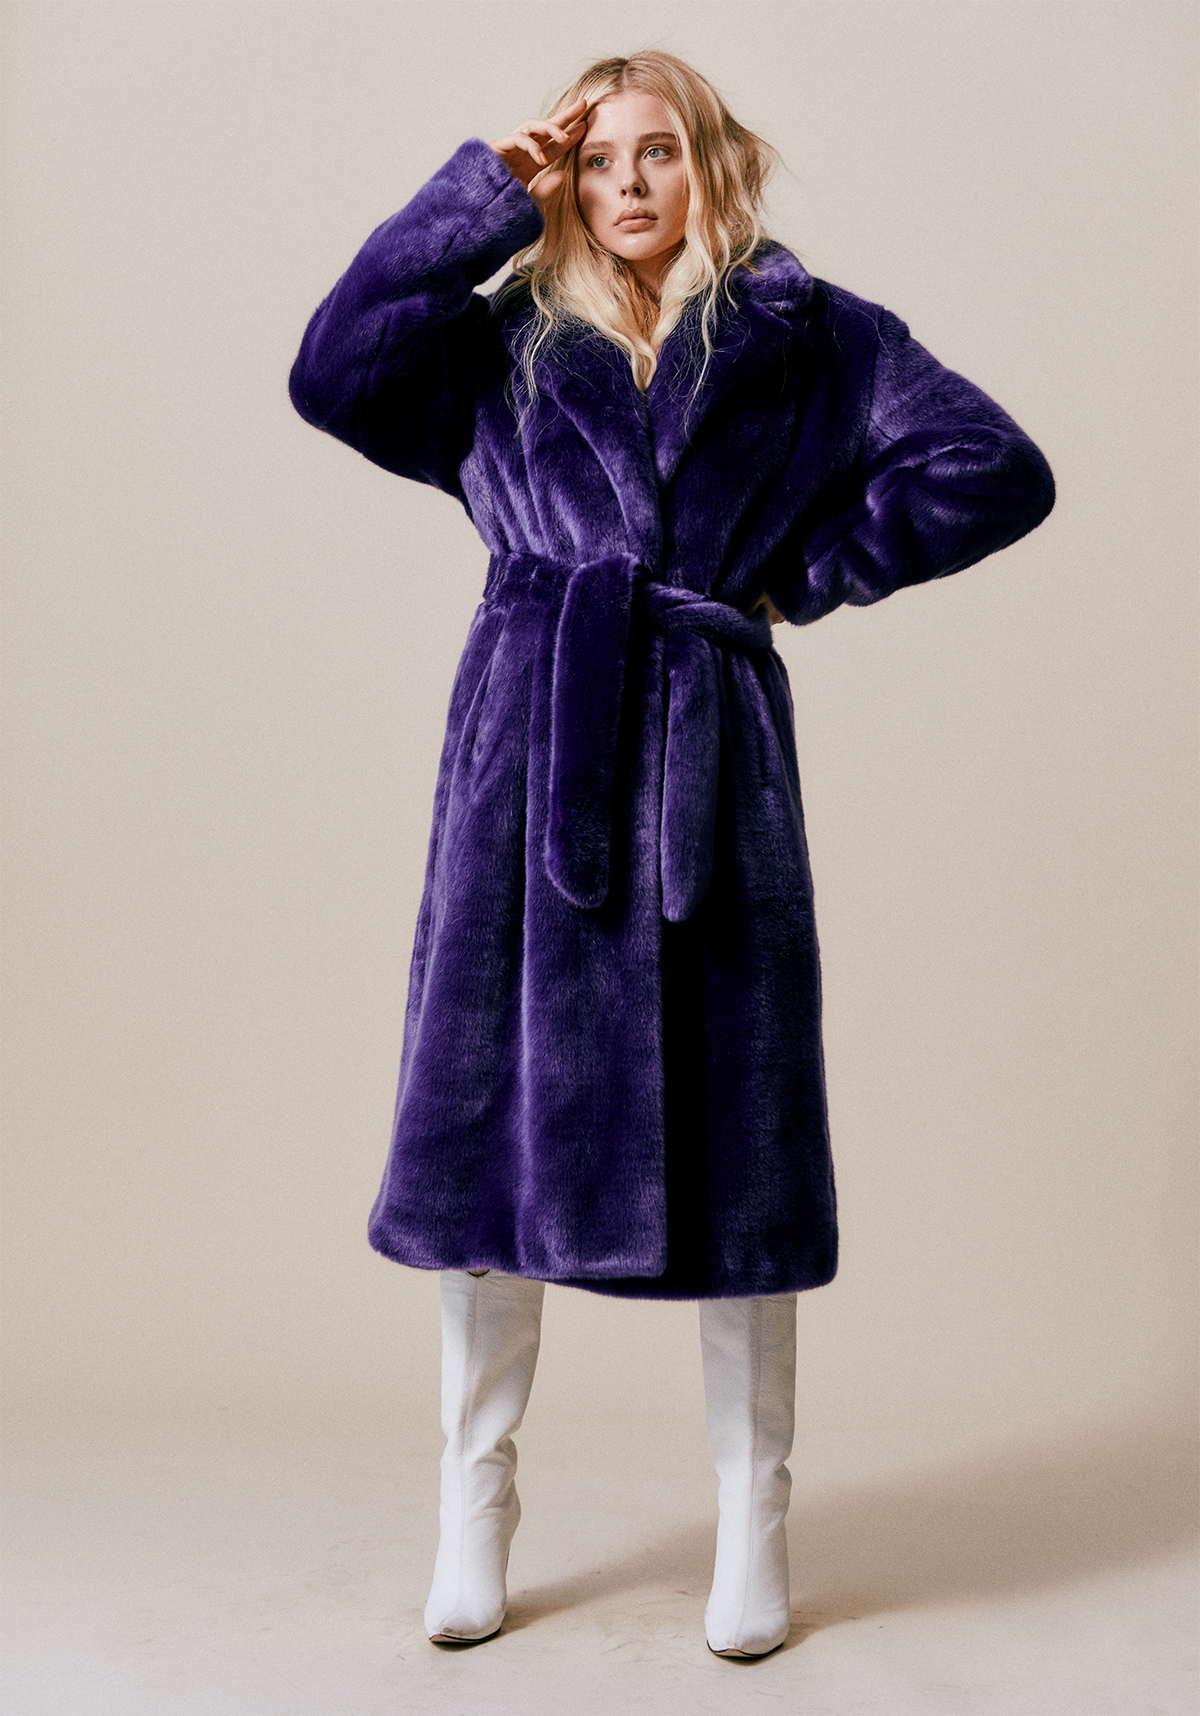 Chloë-Grace-Moretz-Photographed-by-Harper-Smith-for-Who-Wat-Wear-201800005.jpg